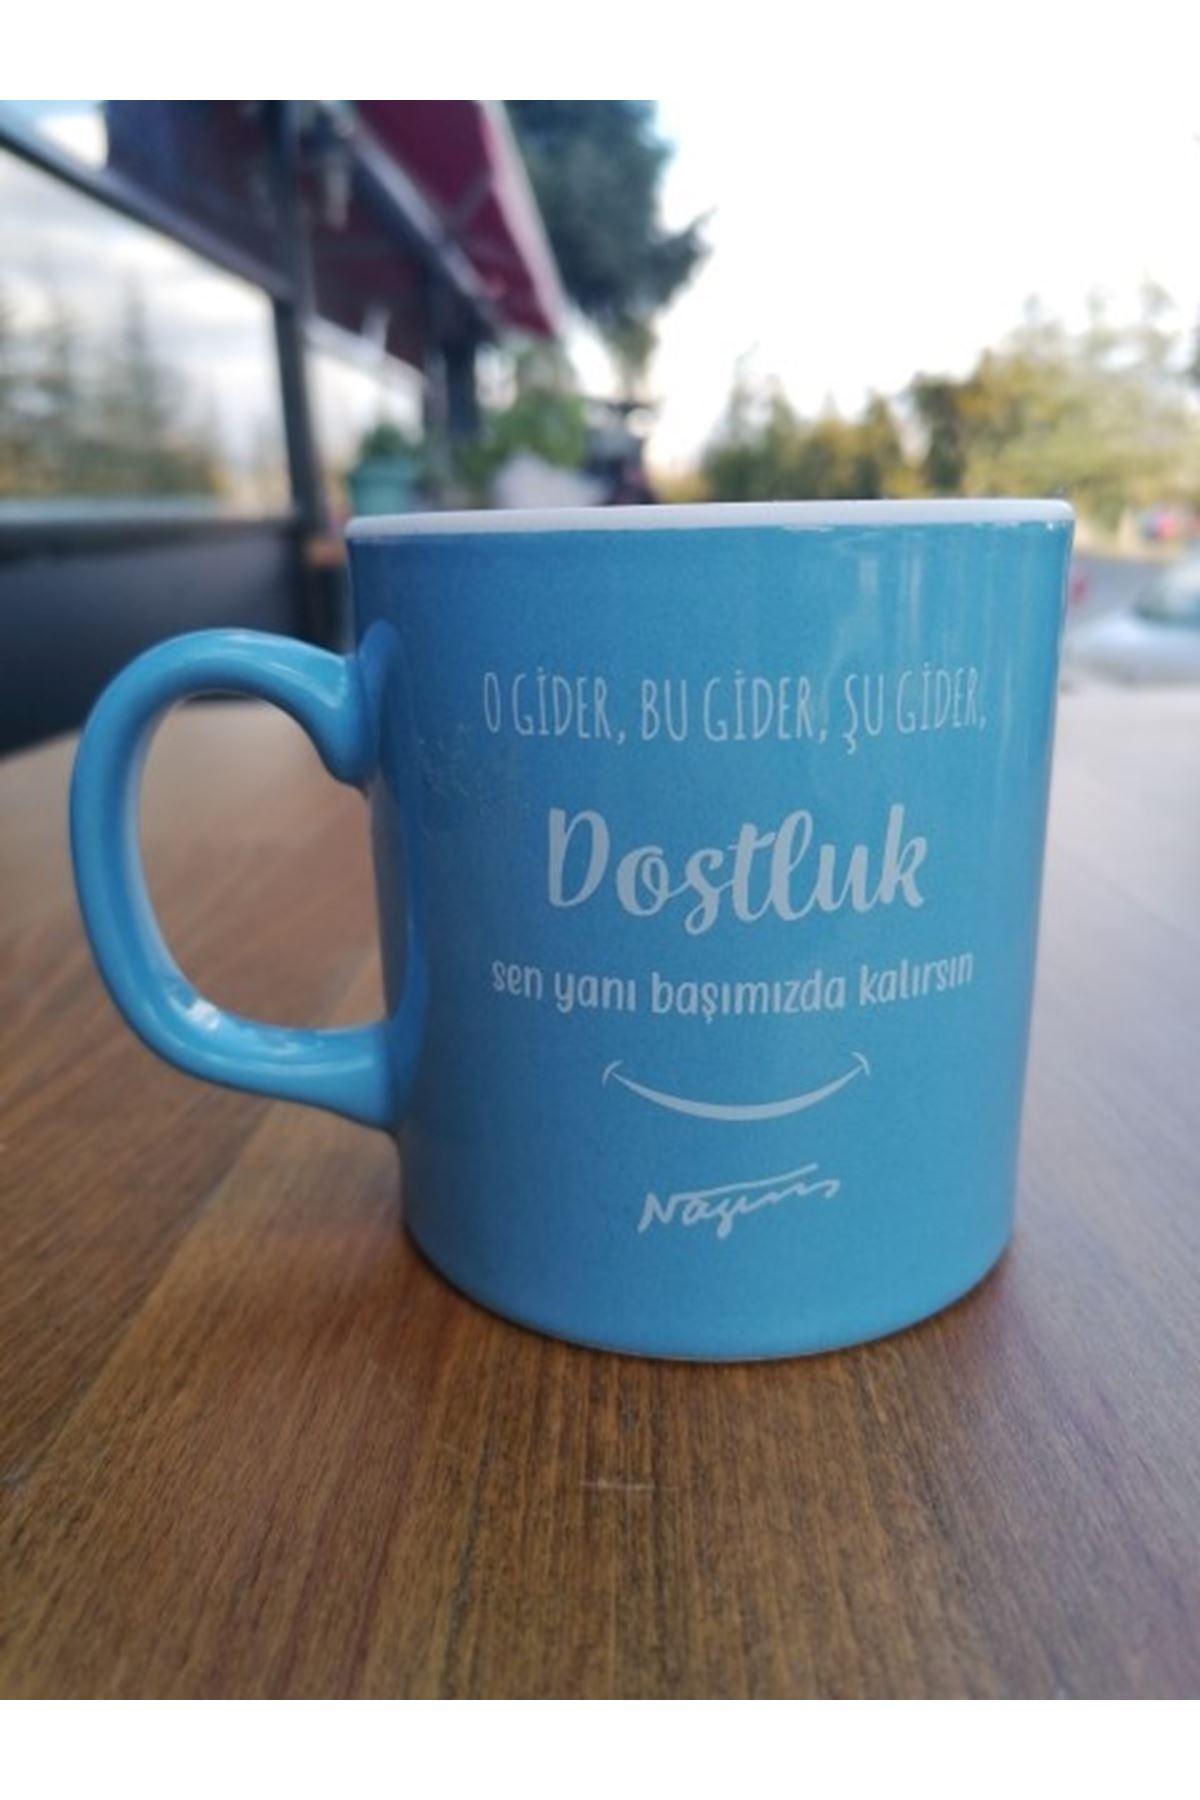 DOSTLUK SEN YANIBAŞIMIZDA KALIRSIN - SERAMİK KUPA MAVİ